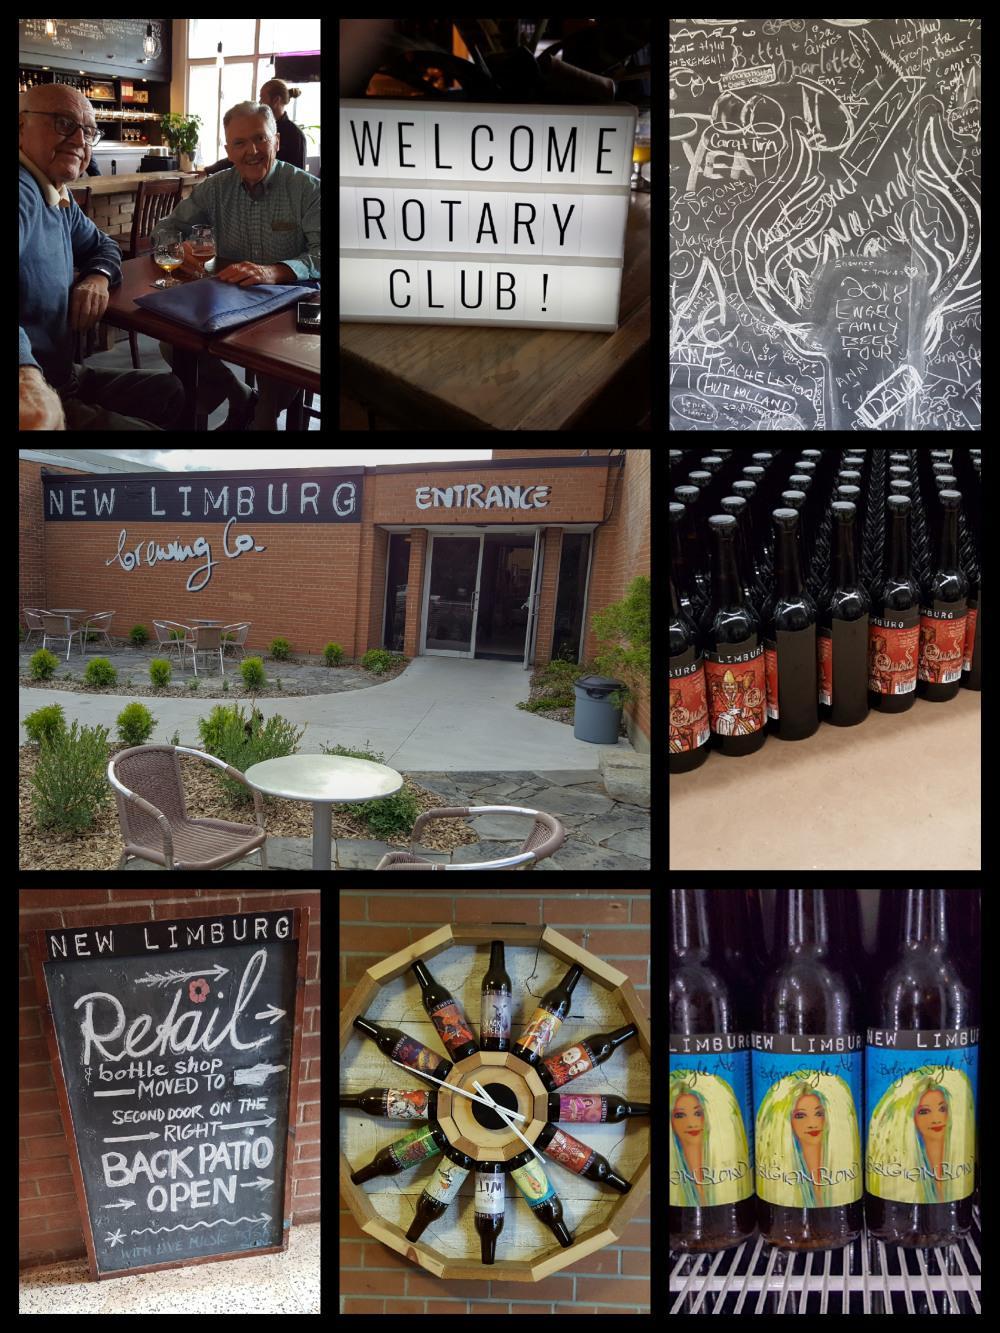 New Limburg Brewery Tour